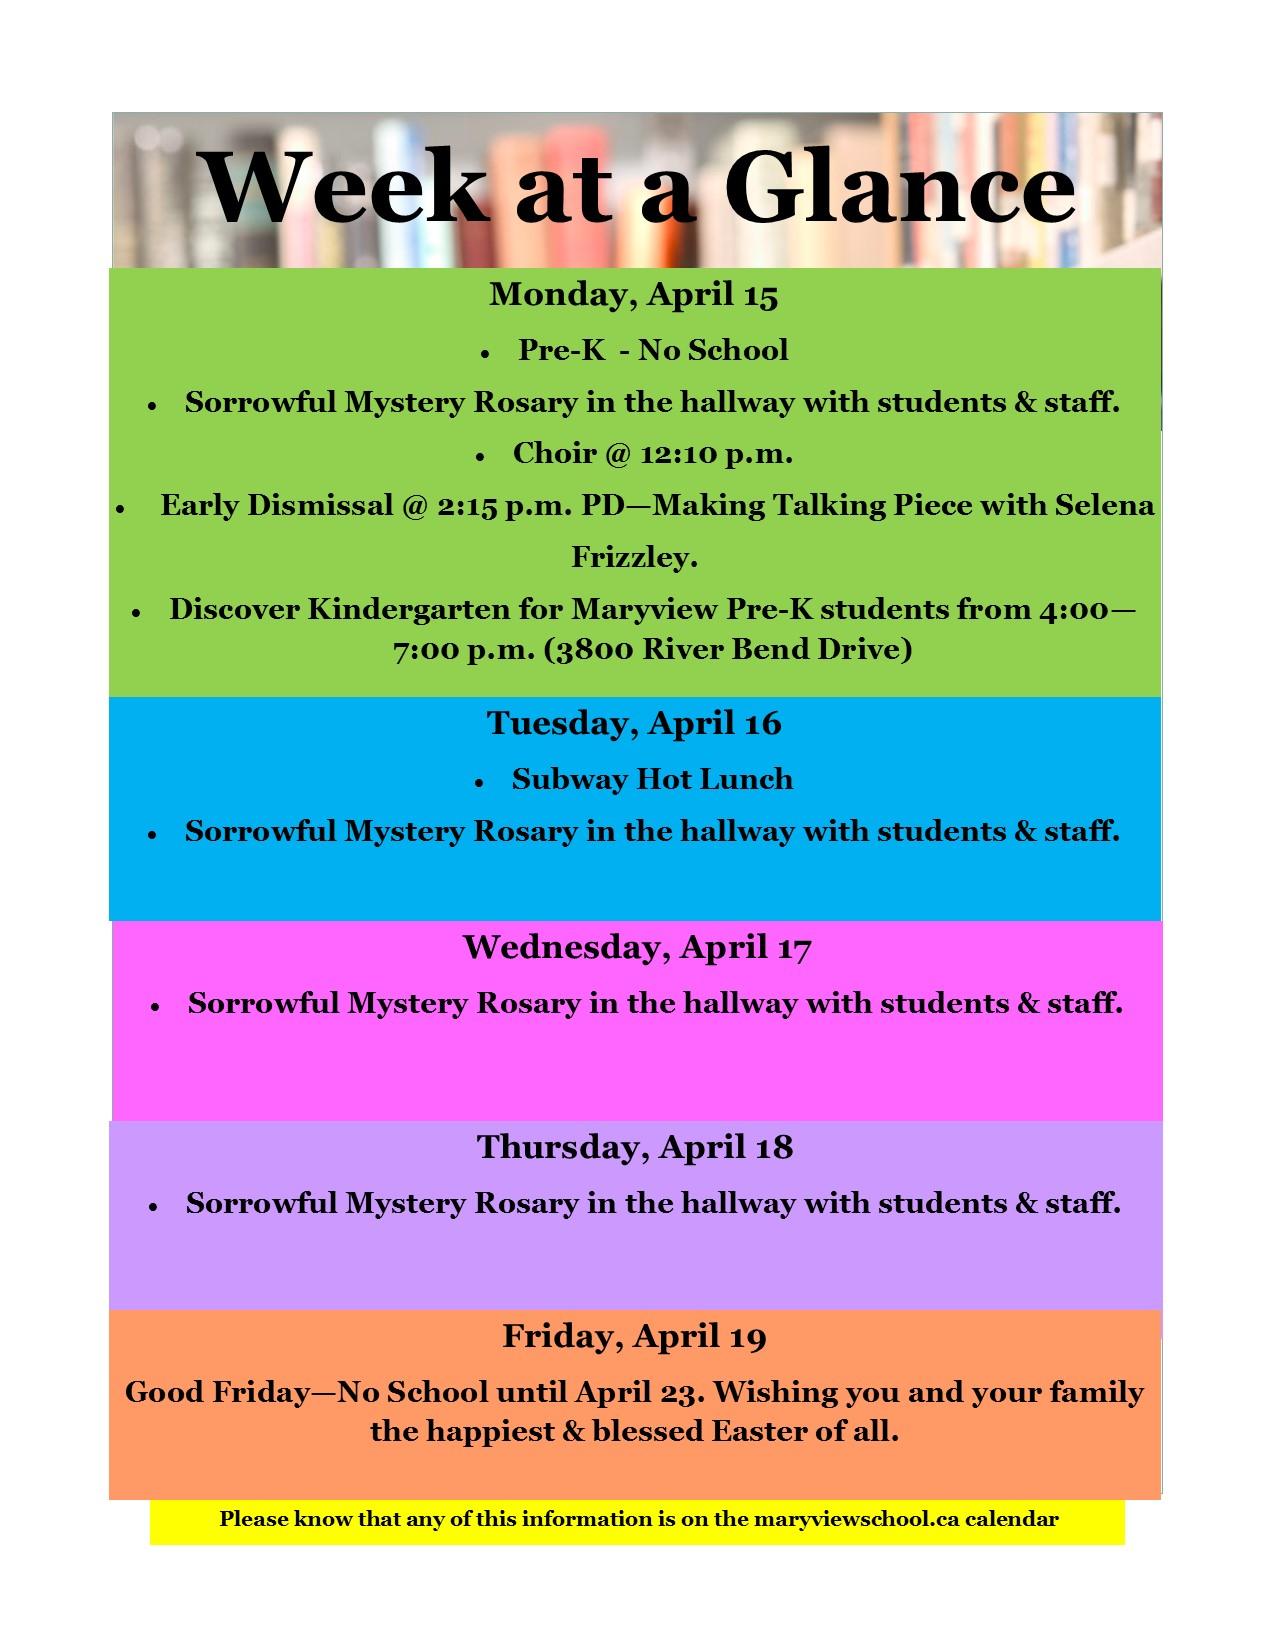 Week At A Glance | Maryview School pertaining to Dawe School Calendar